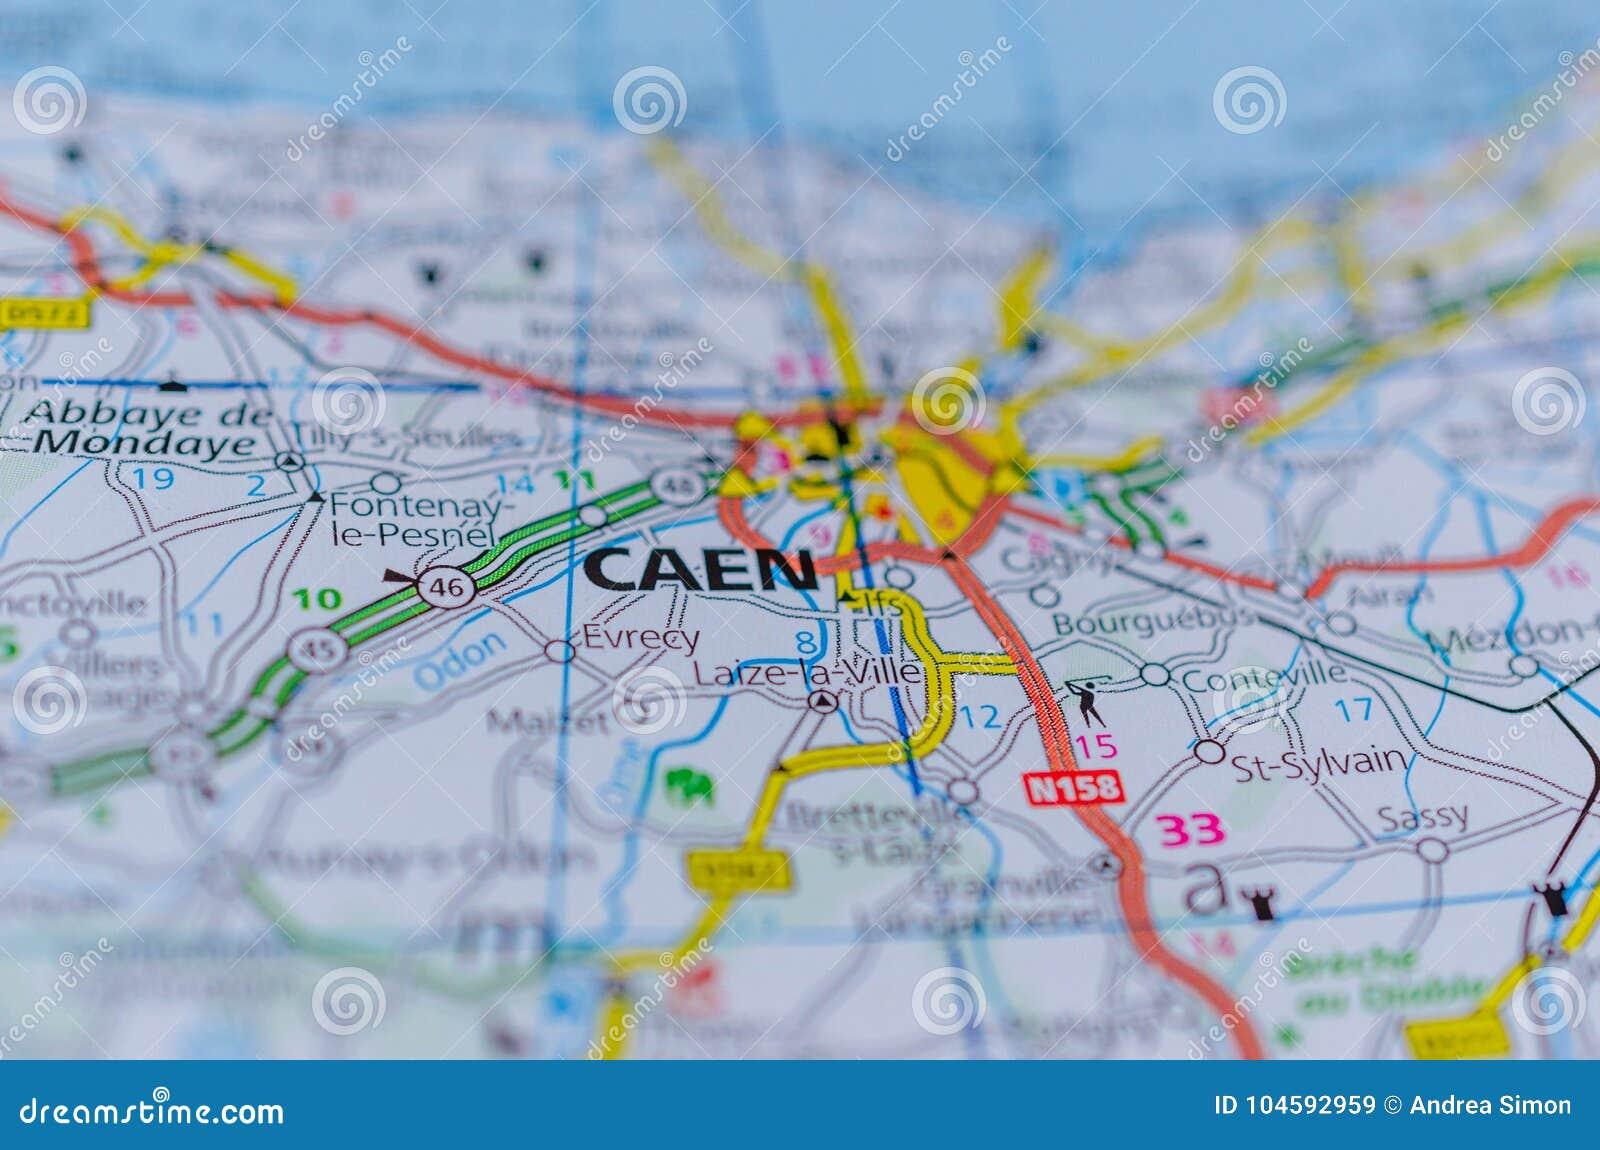 Calvados France Map.Caen On Map Stock Image Image Of Frances Navigation 104592959